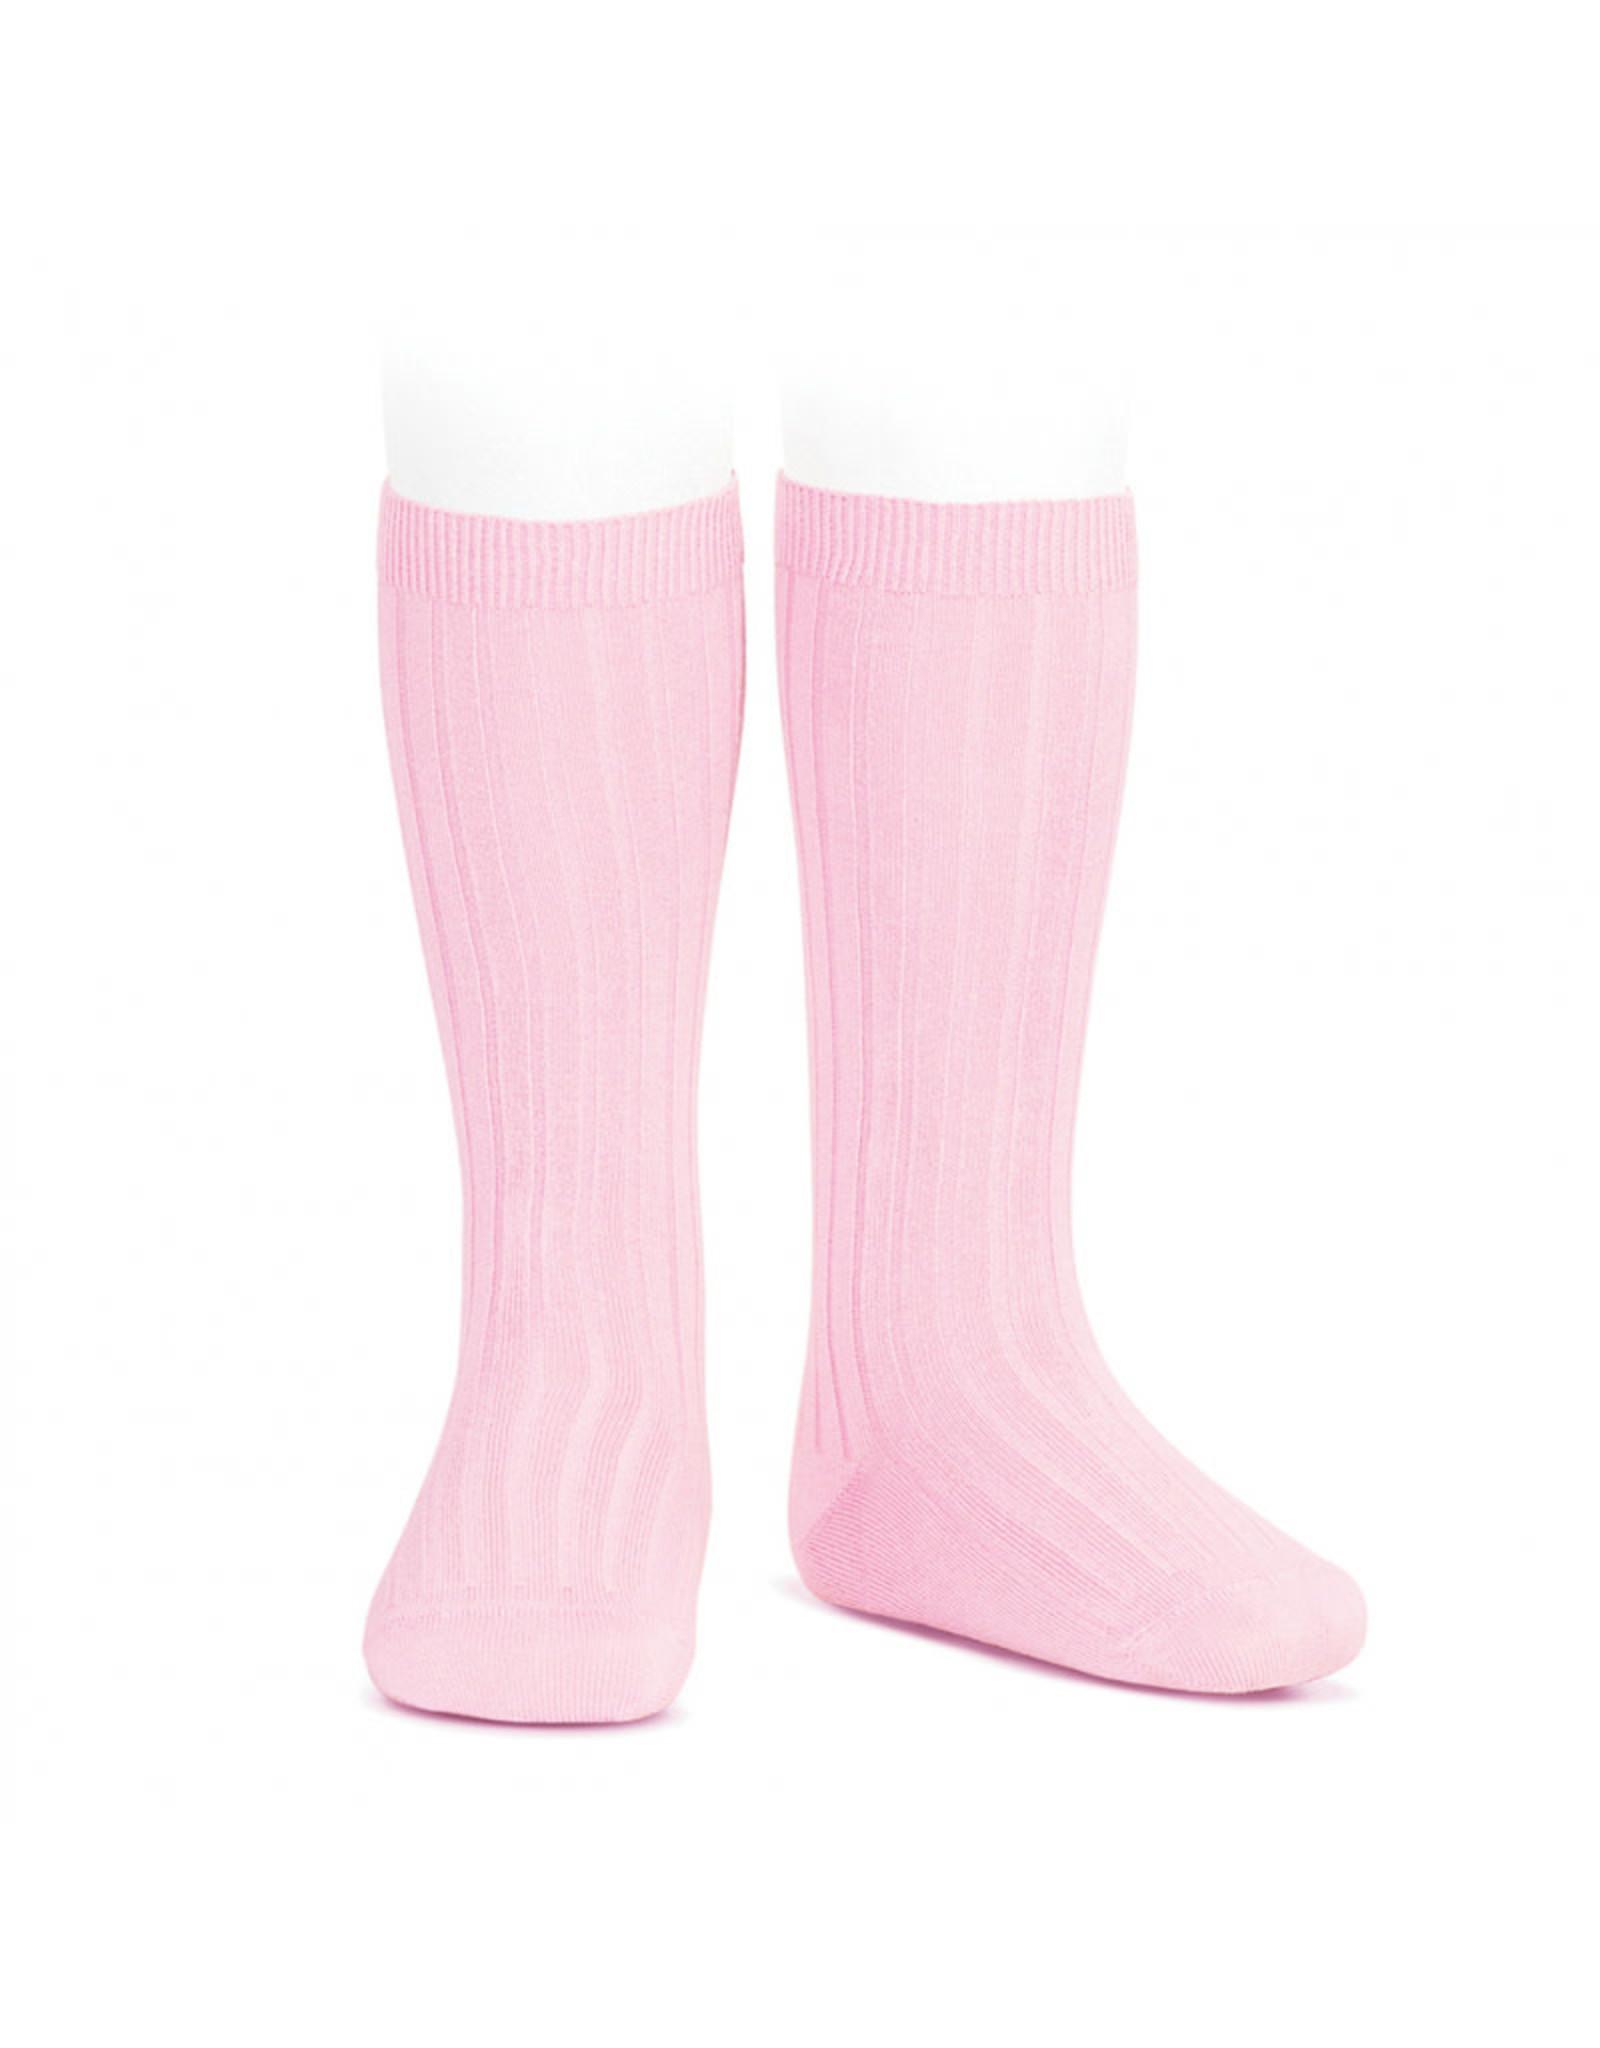 CONDOR Pink Ribbed Knee Socks